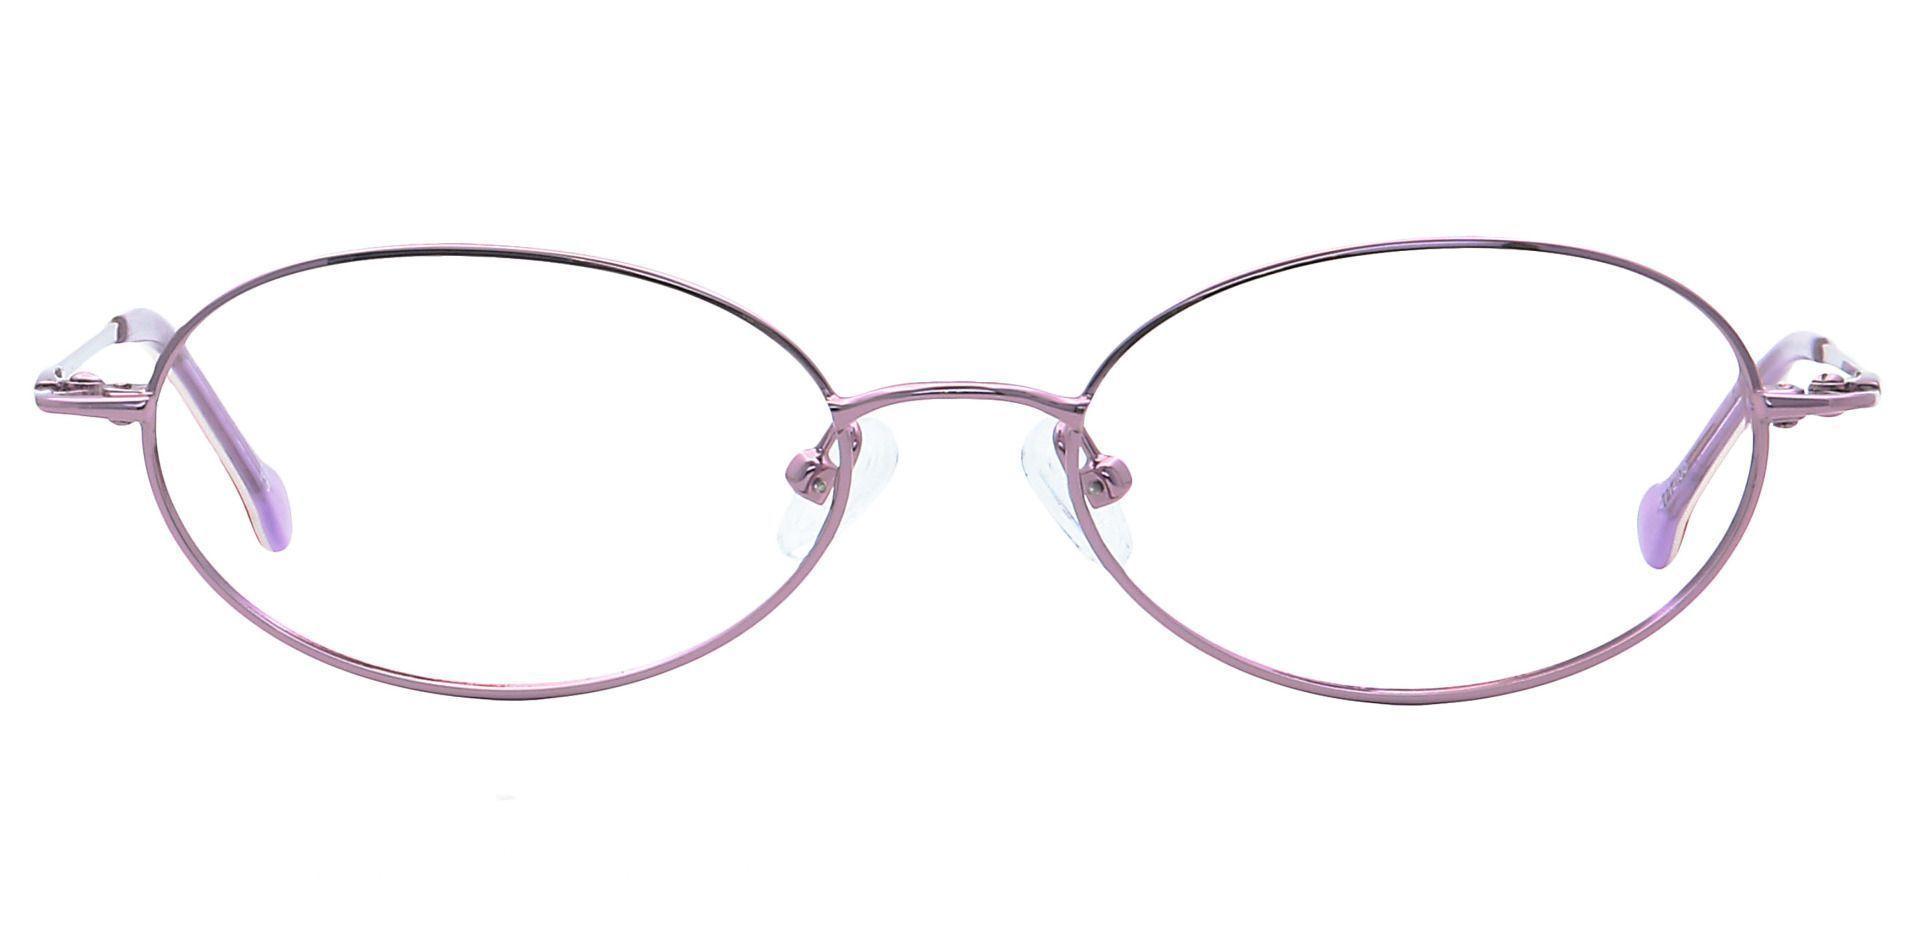 Erika Oval Blue Light Blocking Glasses - Pink